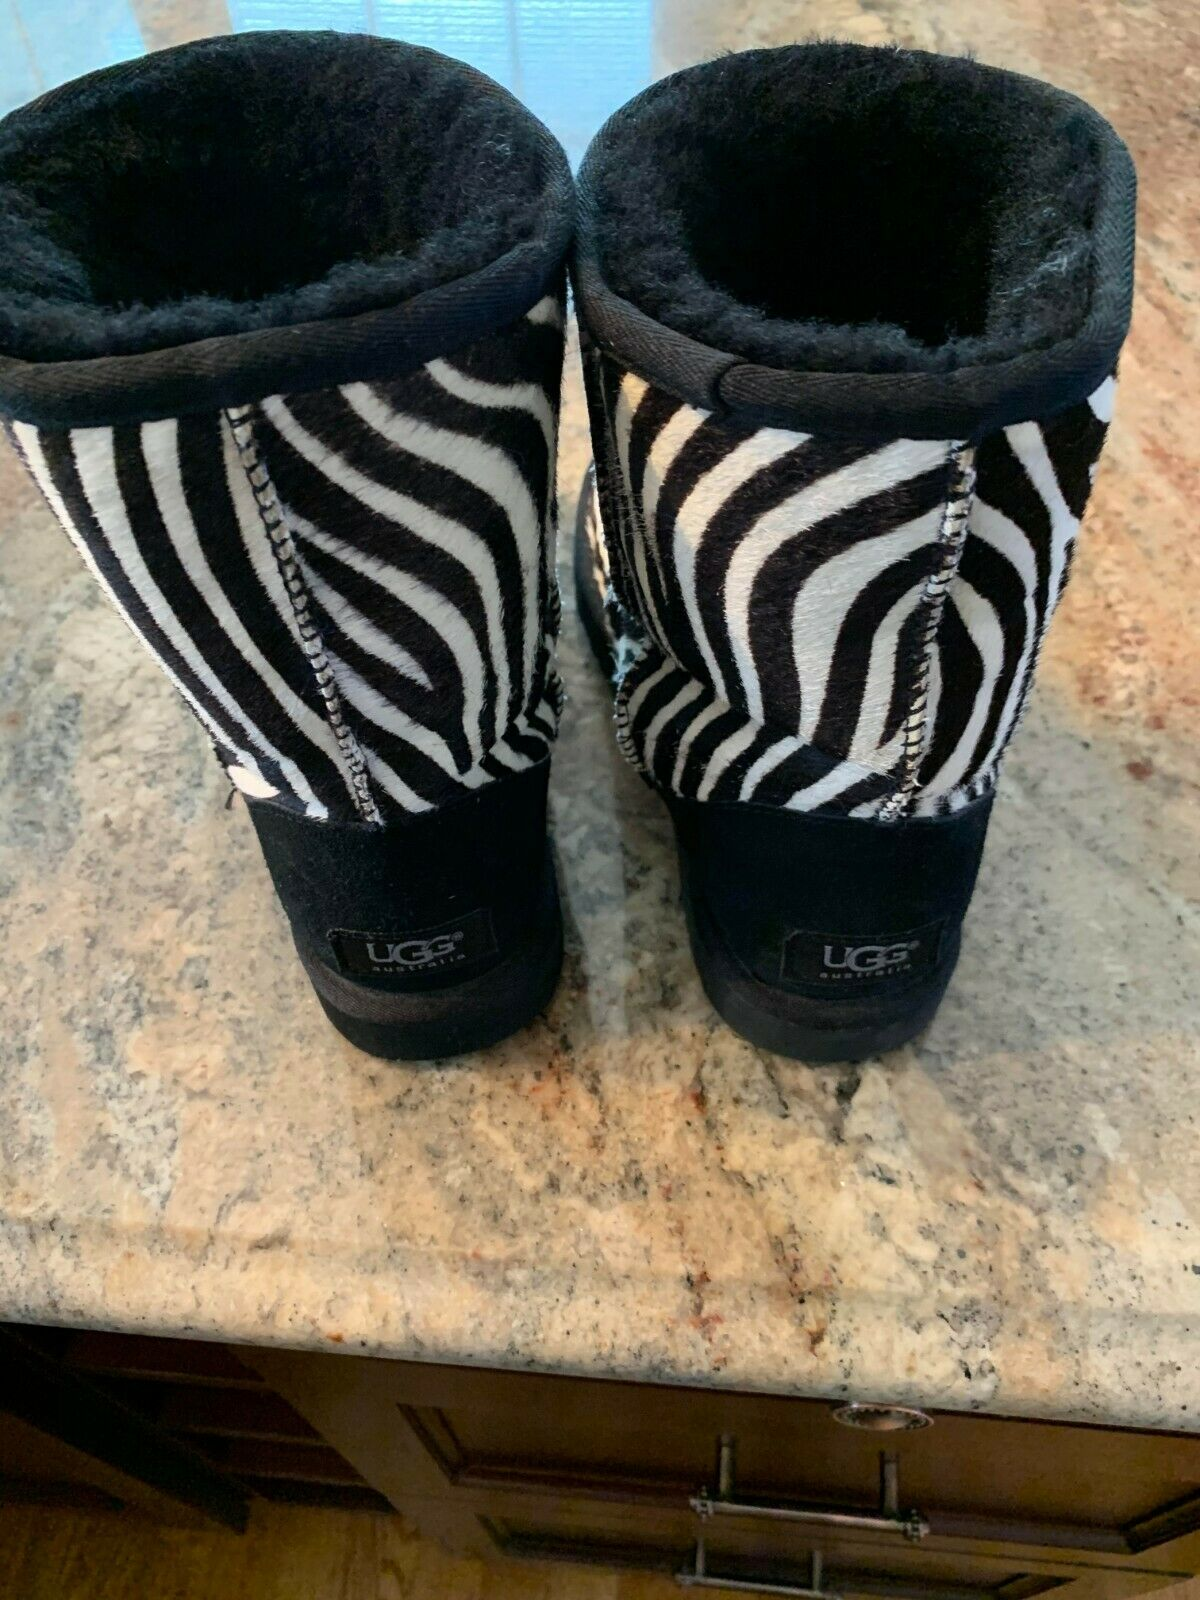 UGG CLASSIC EXOTIC ZEBRA BOOTS, WOMEN'S US 5, BLA… - image 2